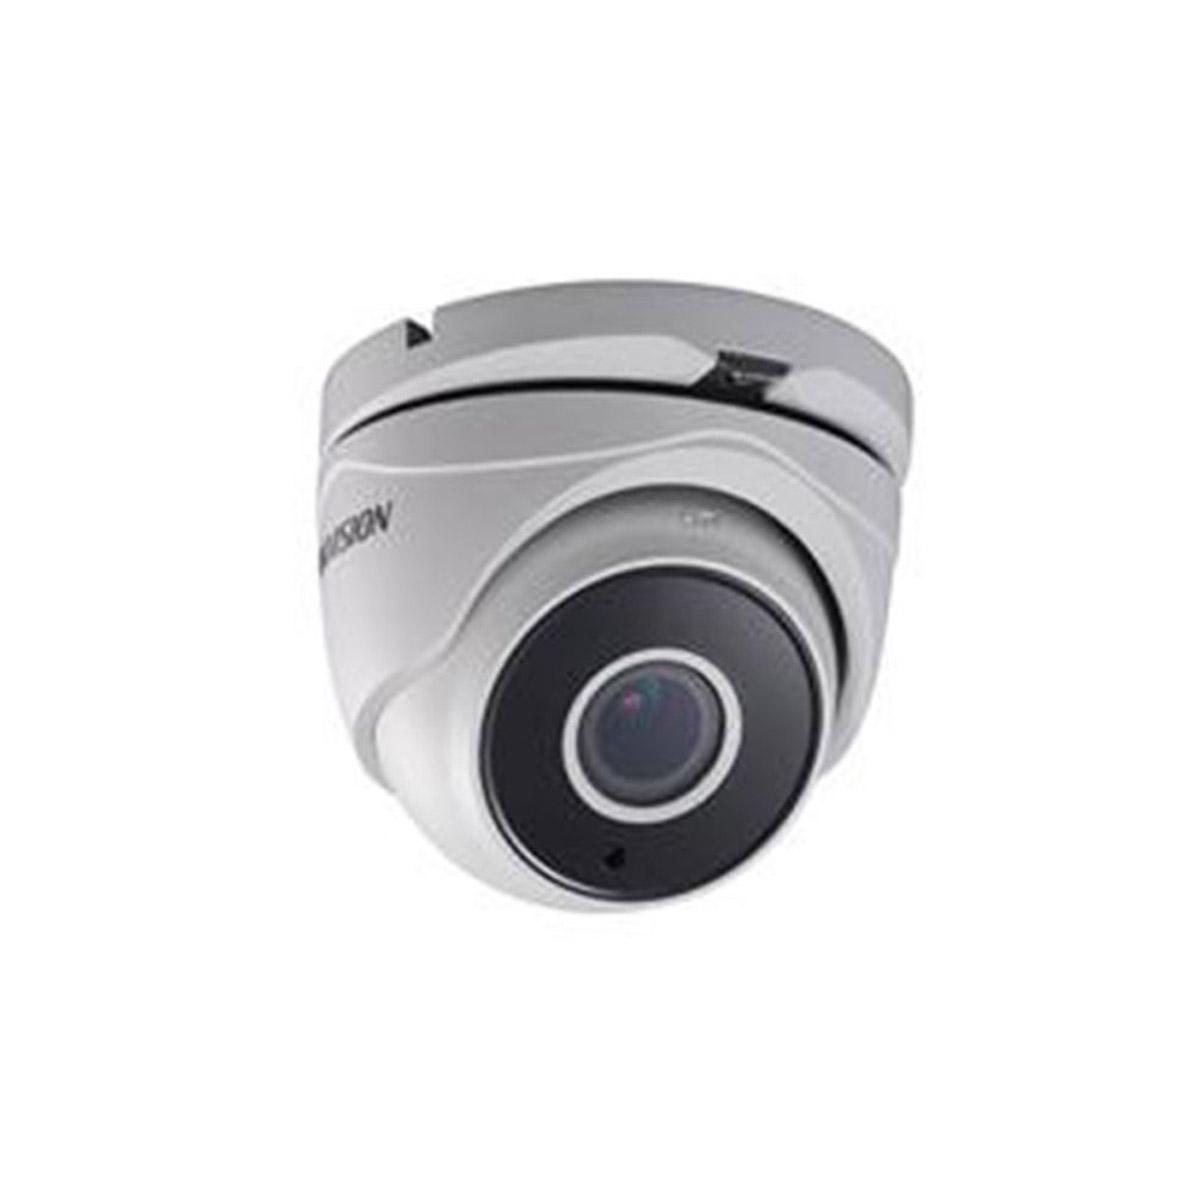 Cámara Hikvision DS-2CE56H0T-ITMF 5MP Tipo Domo